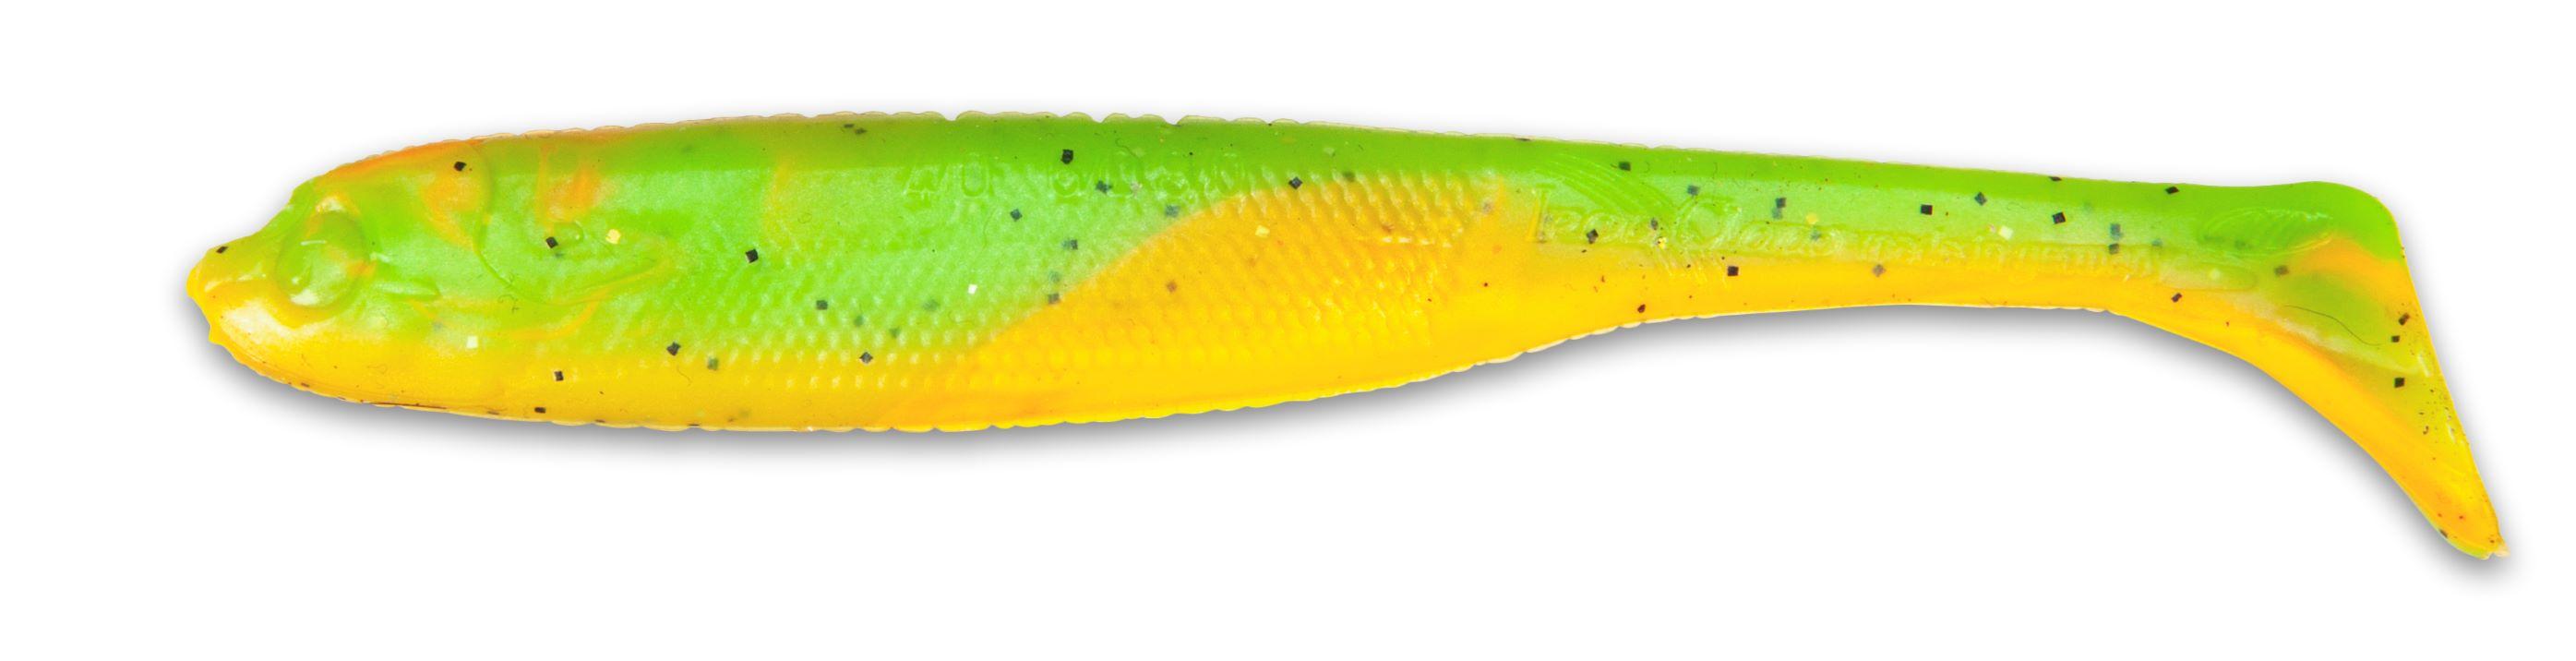 Iron Claw nástraha Slim Jim Non Toxic 13 cm Vzor RFT